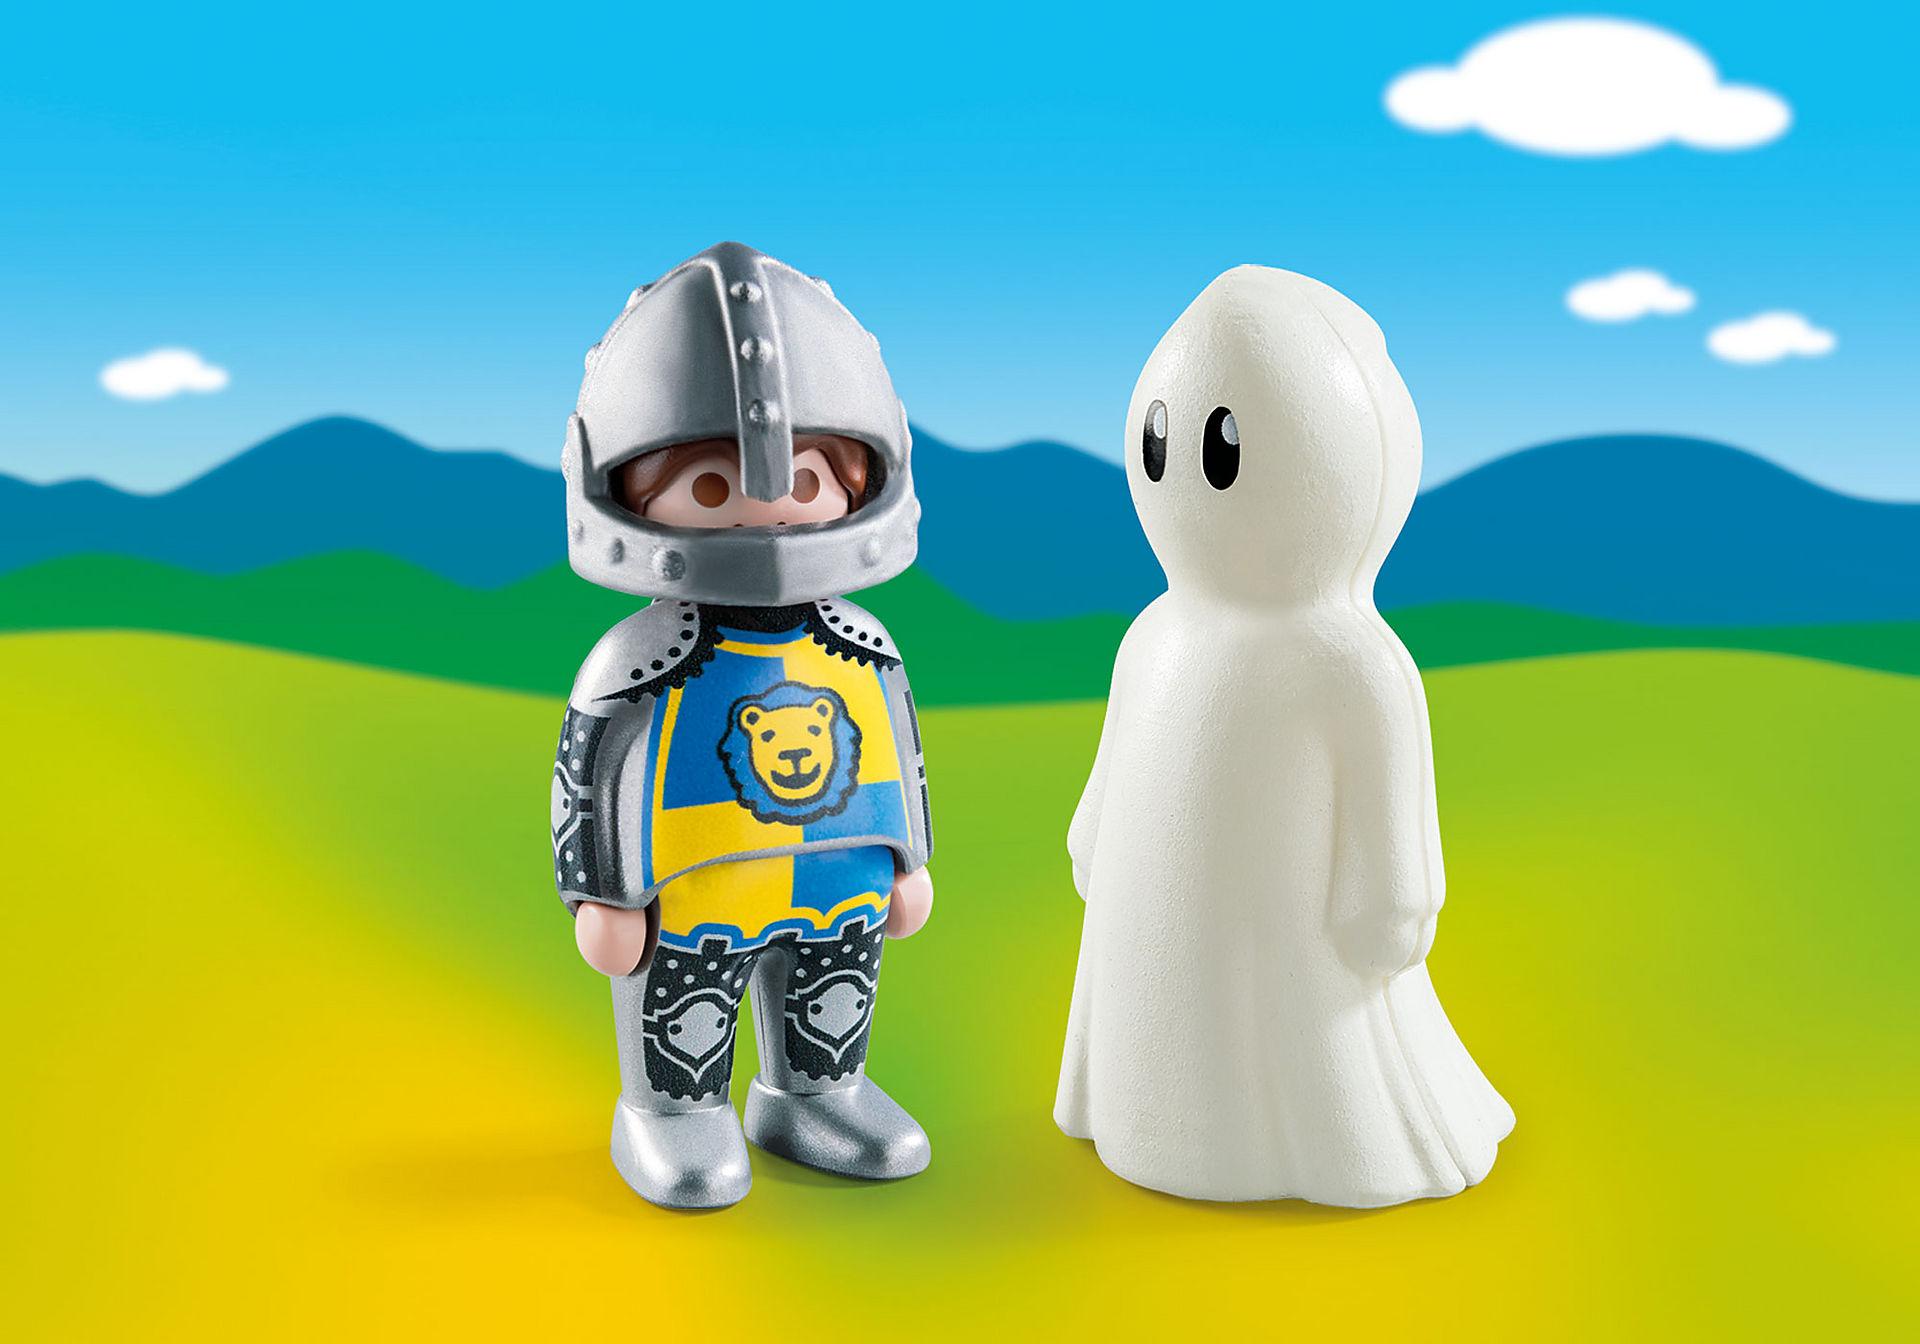 70128 1.2.3 Caballero con Fantasma zoom image1